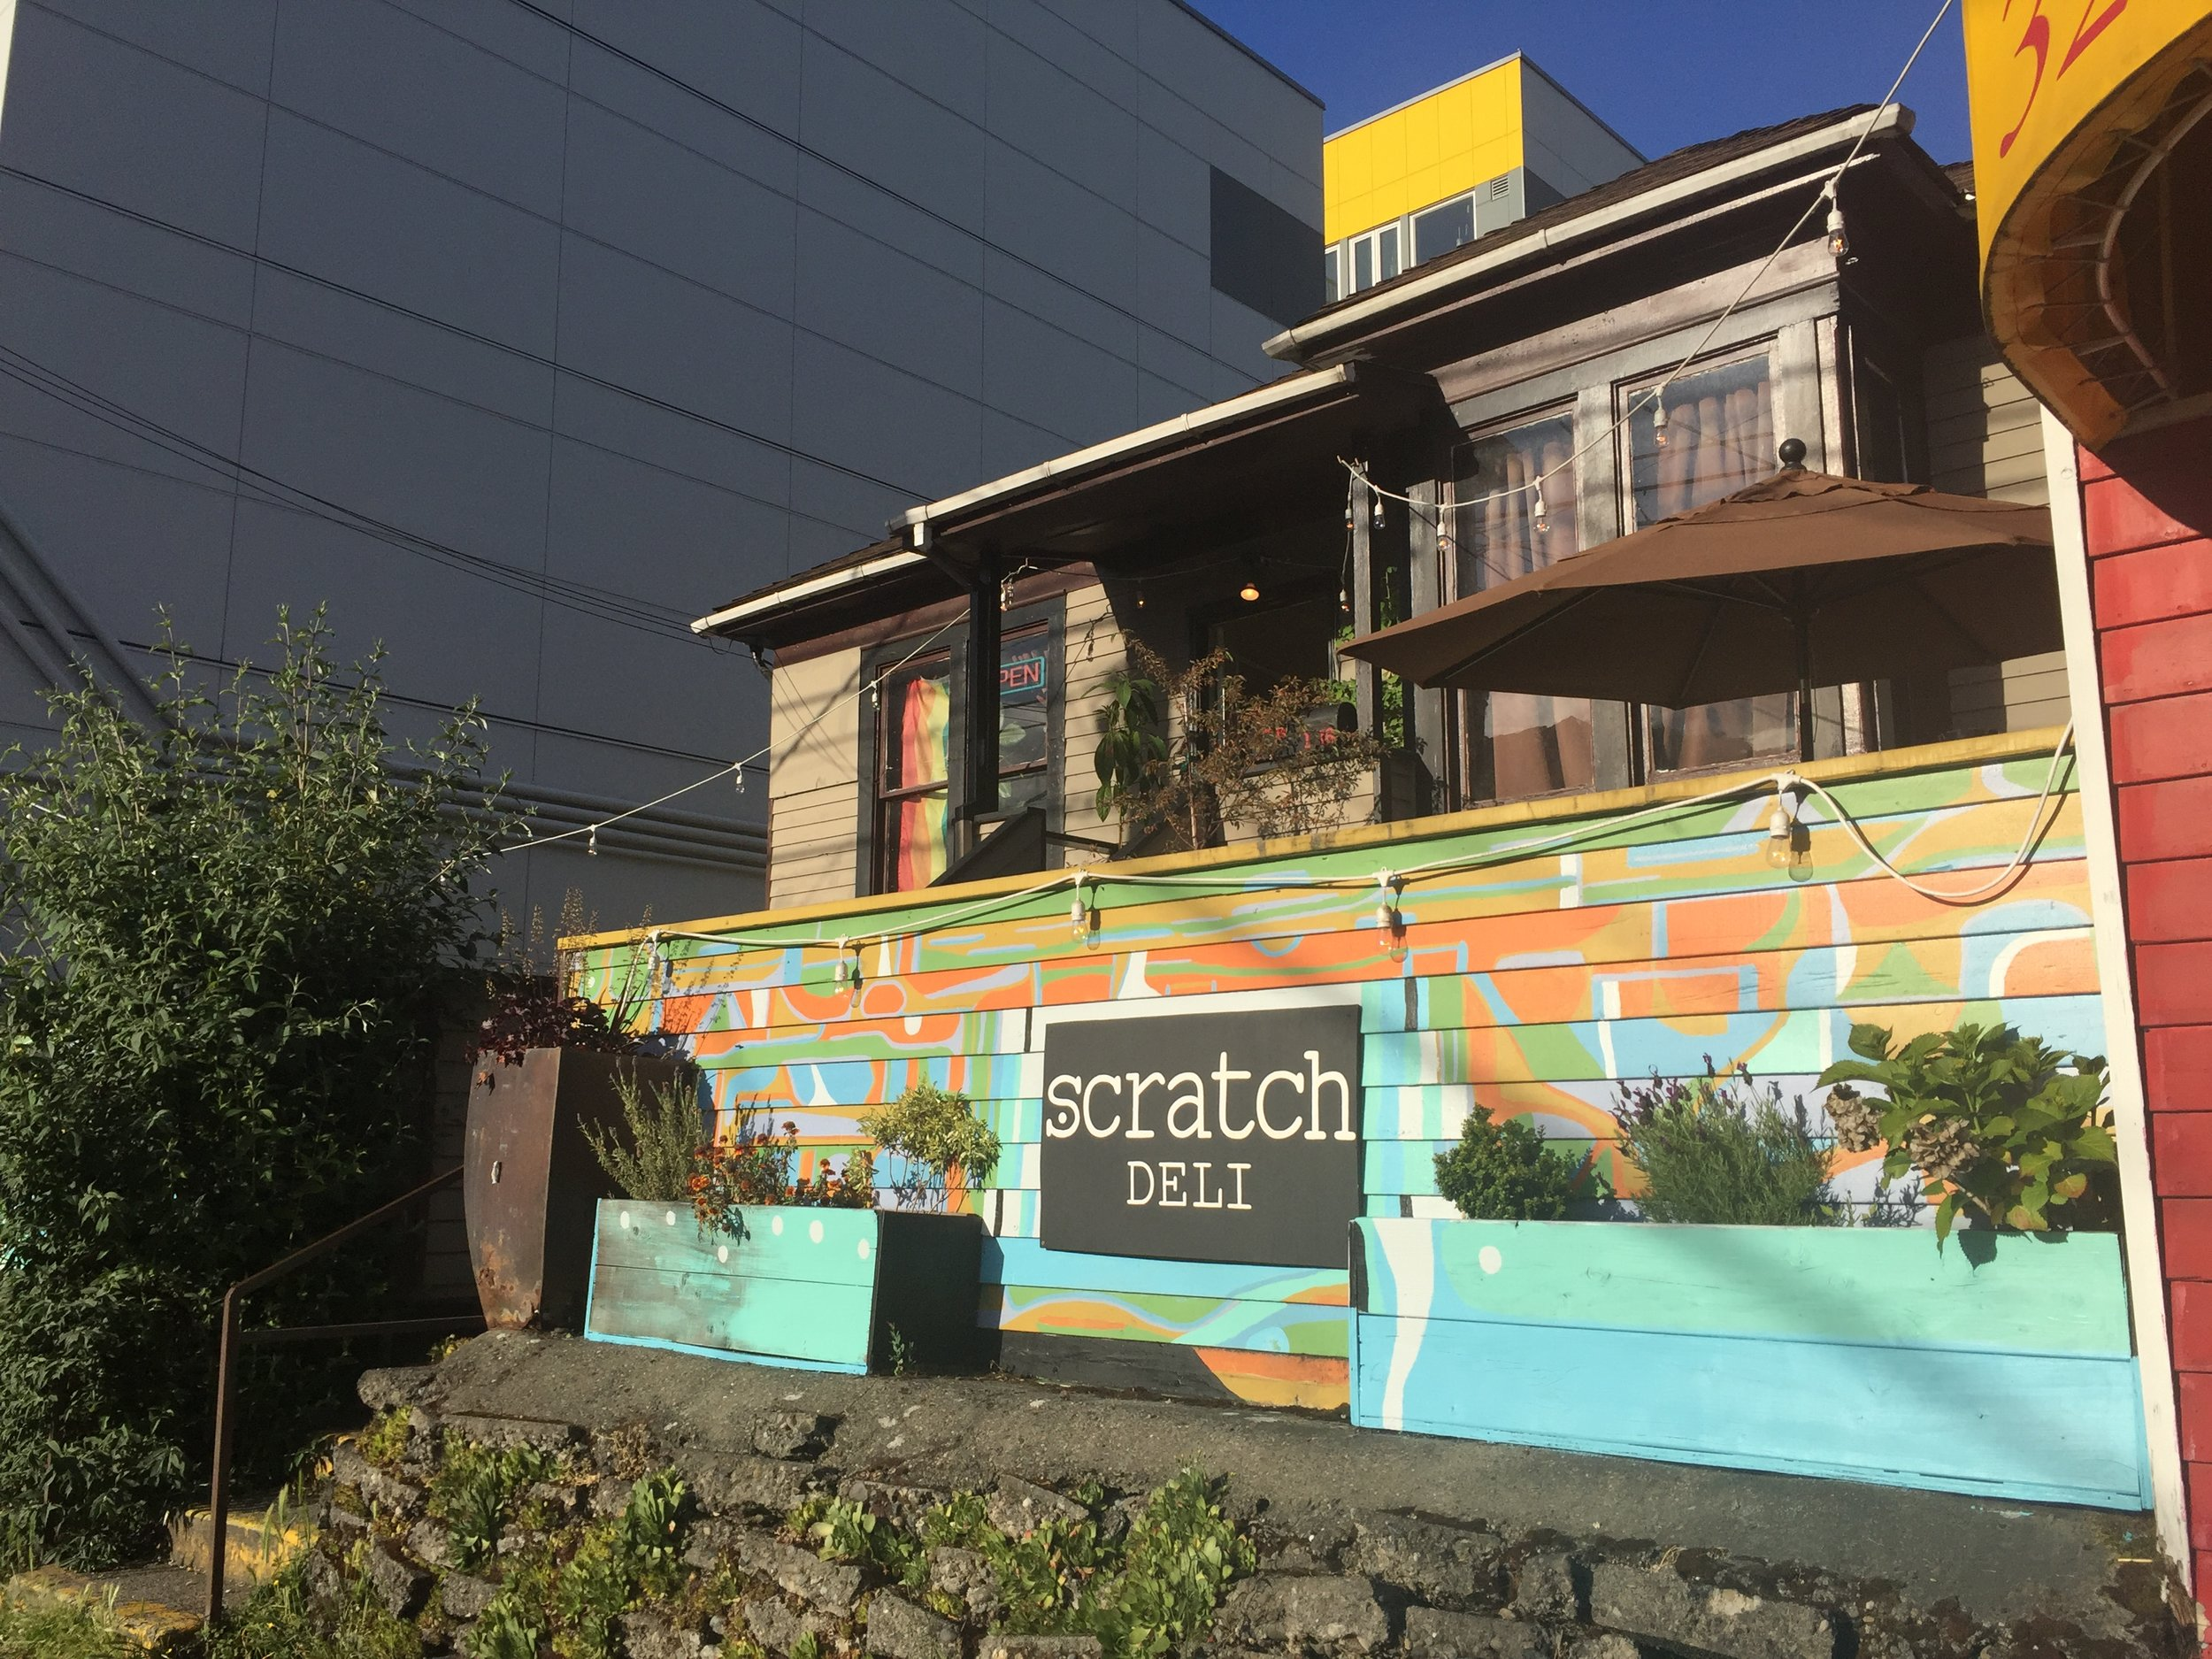 Scratch Deli at 1718 12th Avenue in Capitol Hill